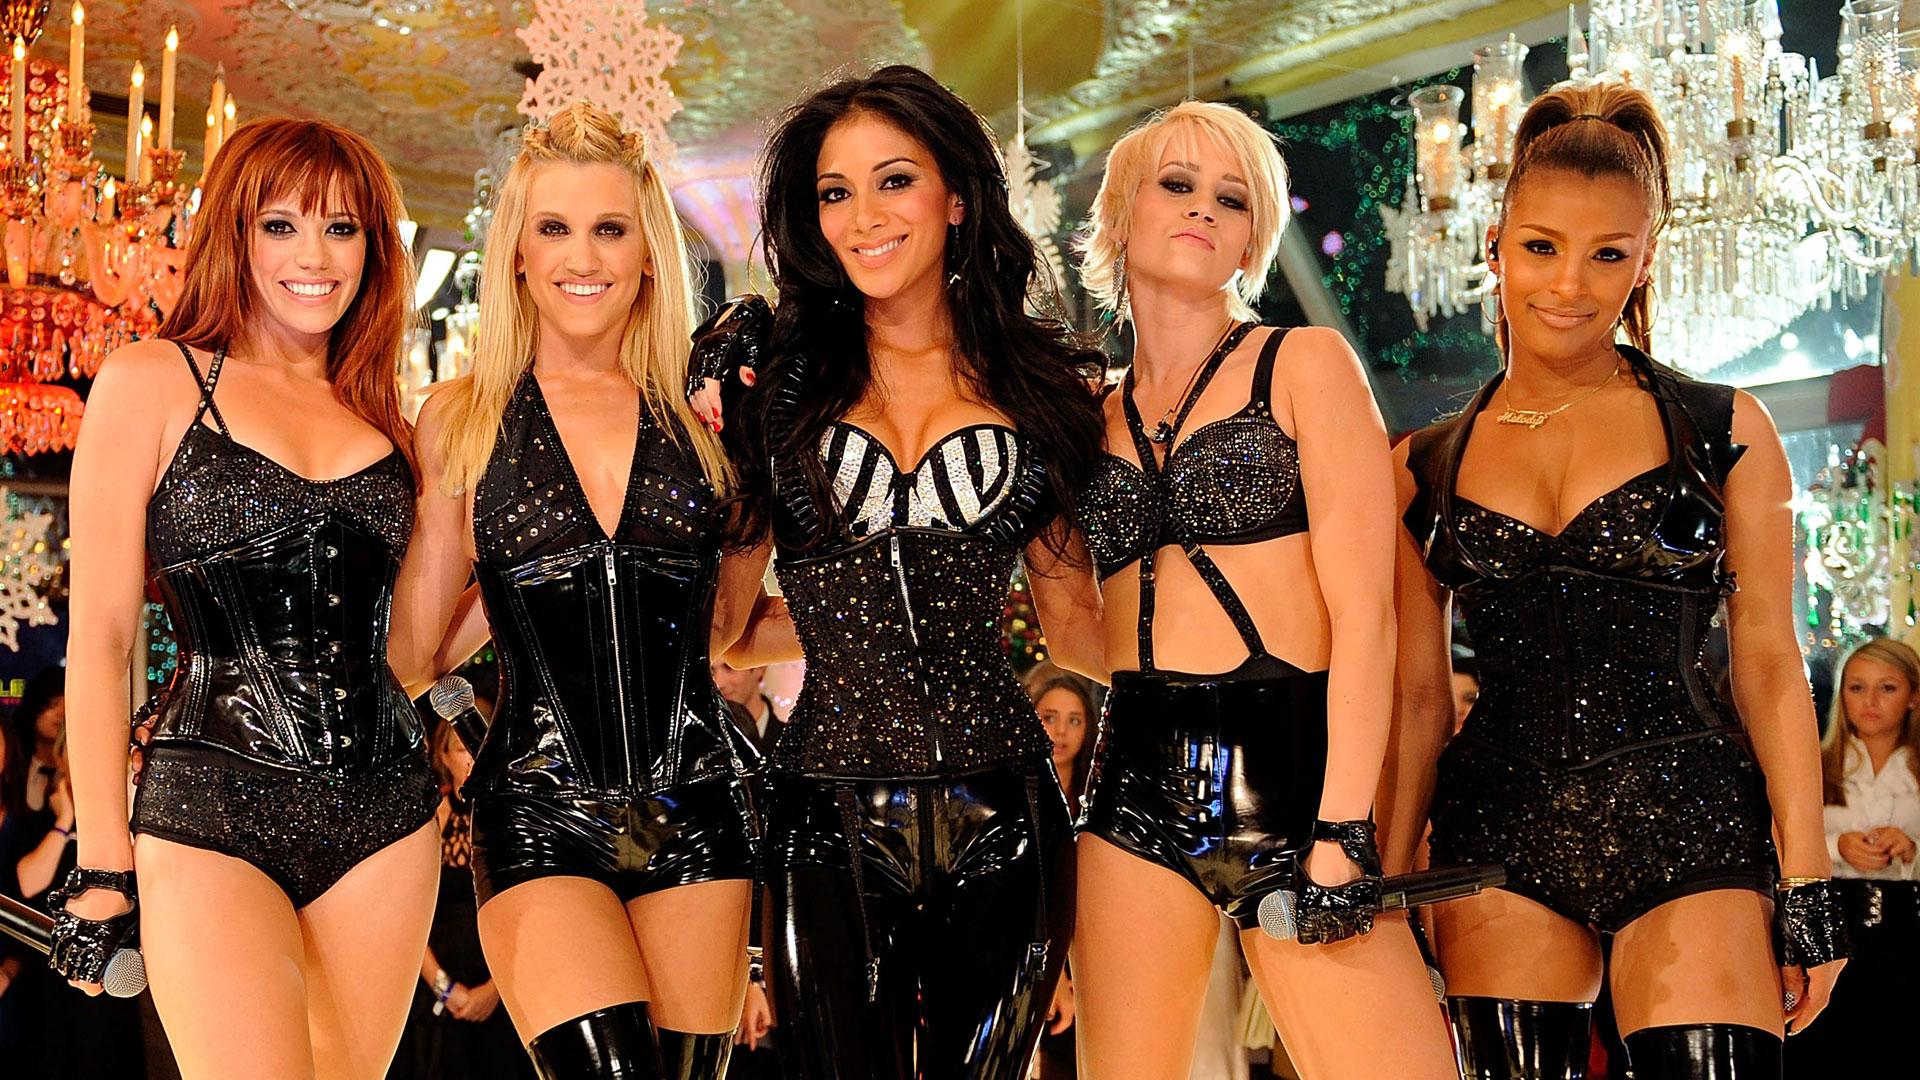 The Pussycat Dolls - Wikipedia